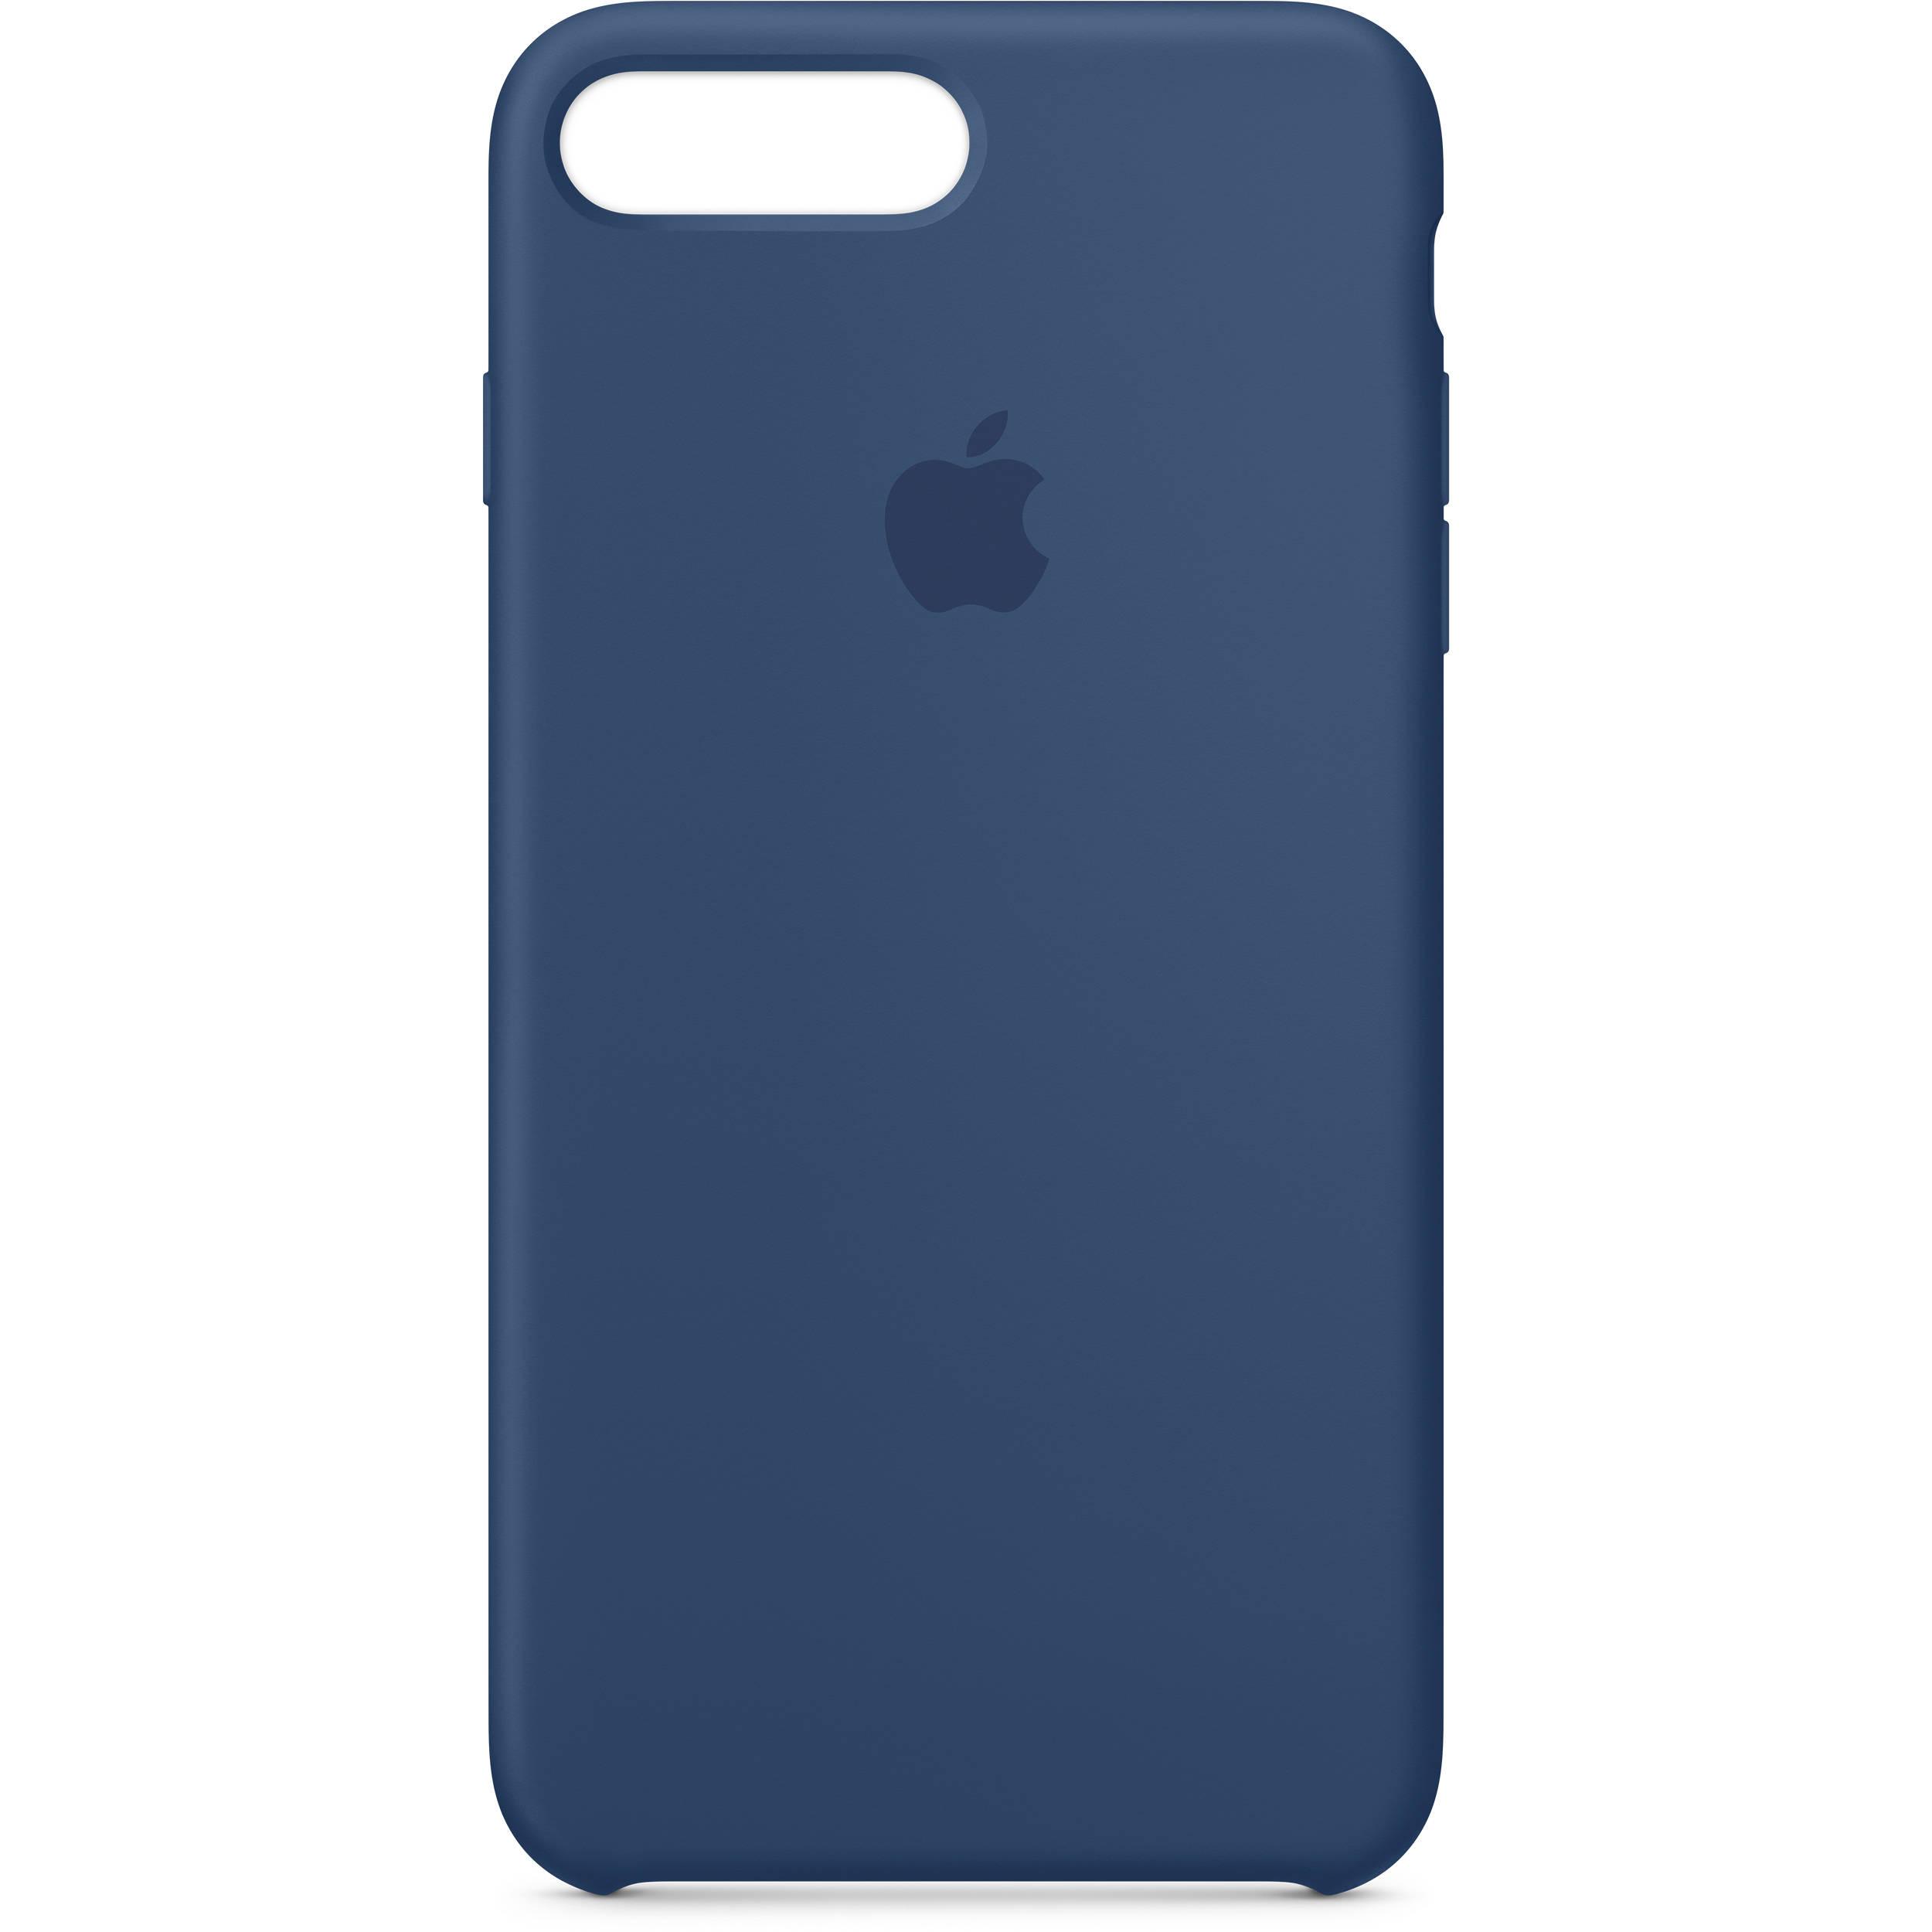 detailed look e03ce bb410 Apple iPhone 7 Plus/8 Plus Silicone Case (Blue Cobalt)